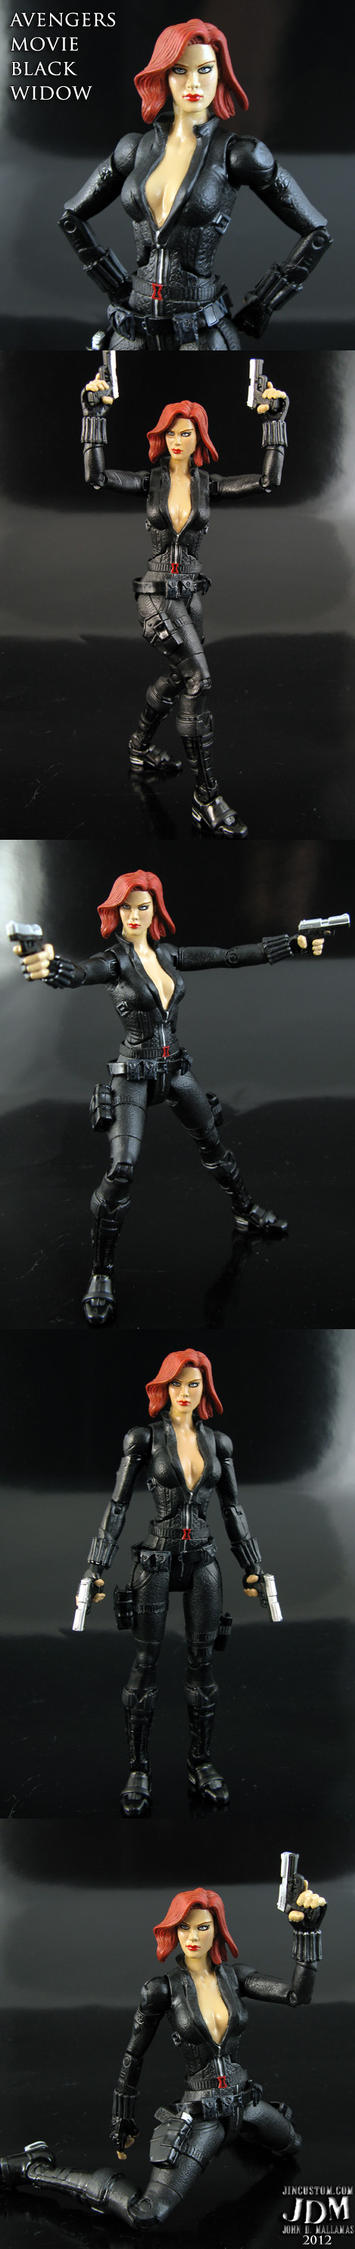 Avengers movie Black Widow Marvel Legends by Jin-Saotome